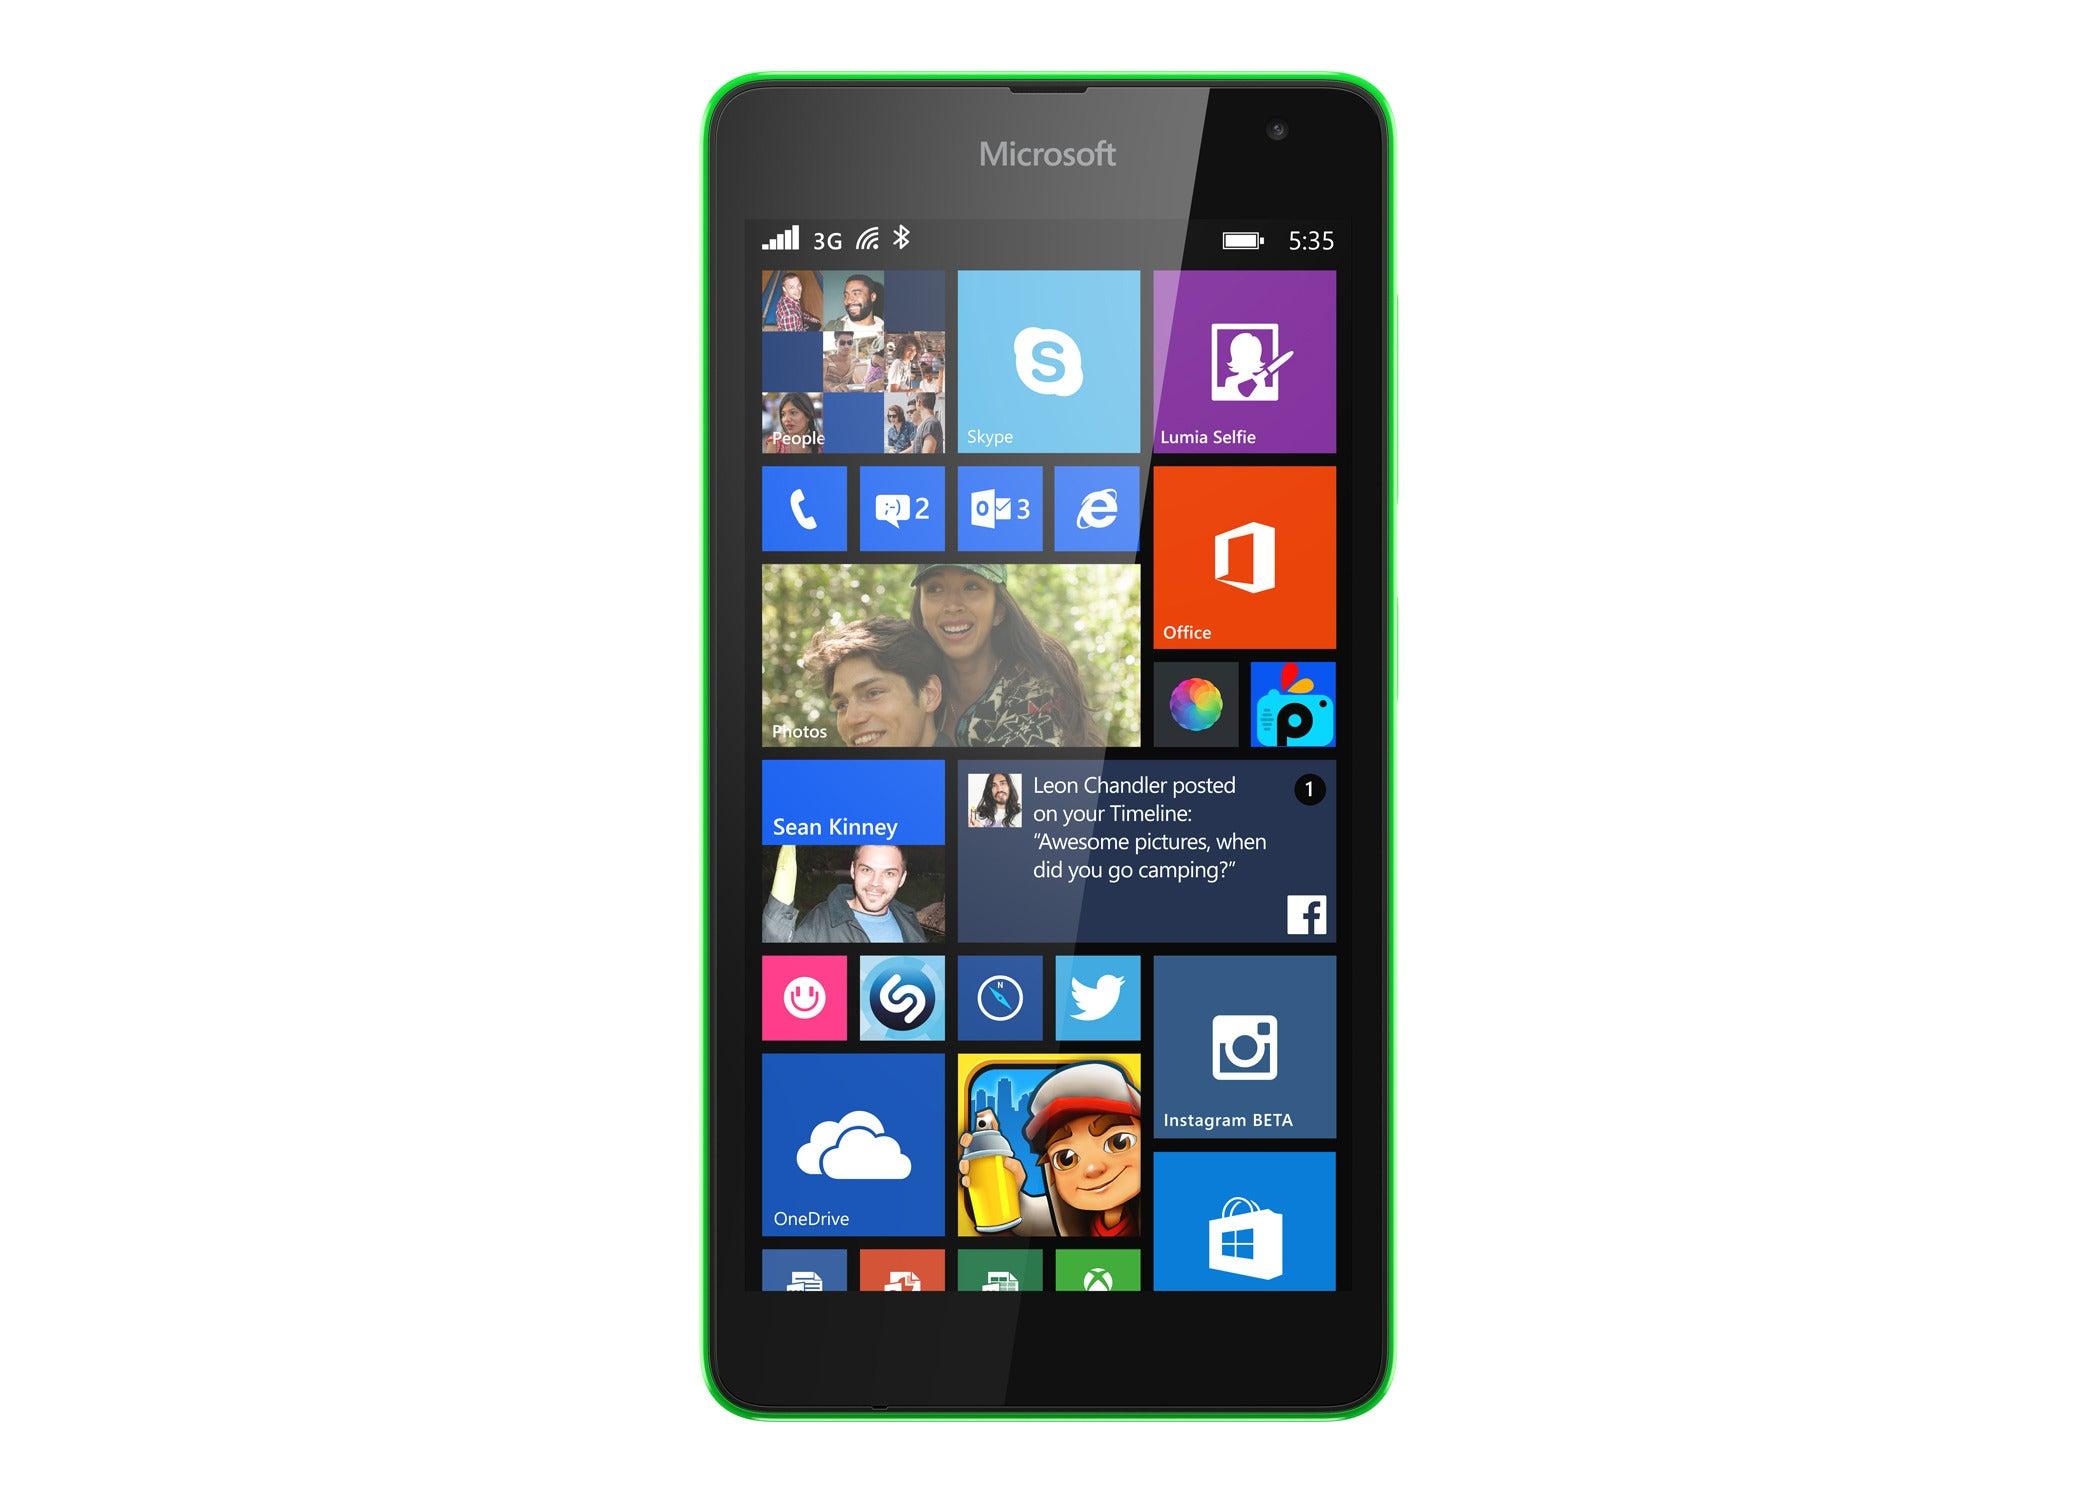 Install Windows 10 on Lumia Devices (Fix App Store)